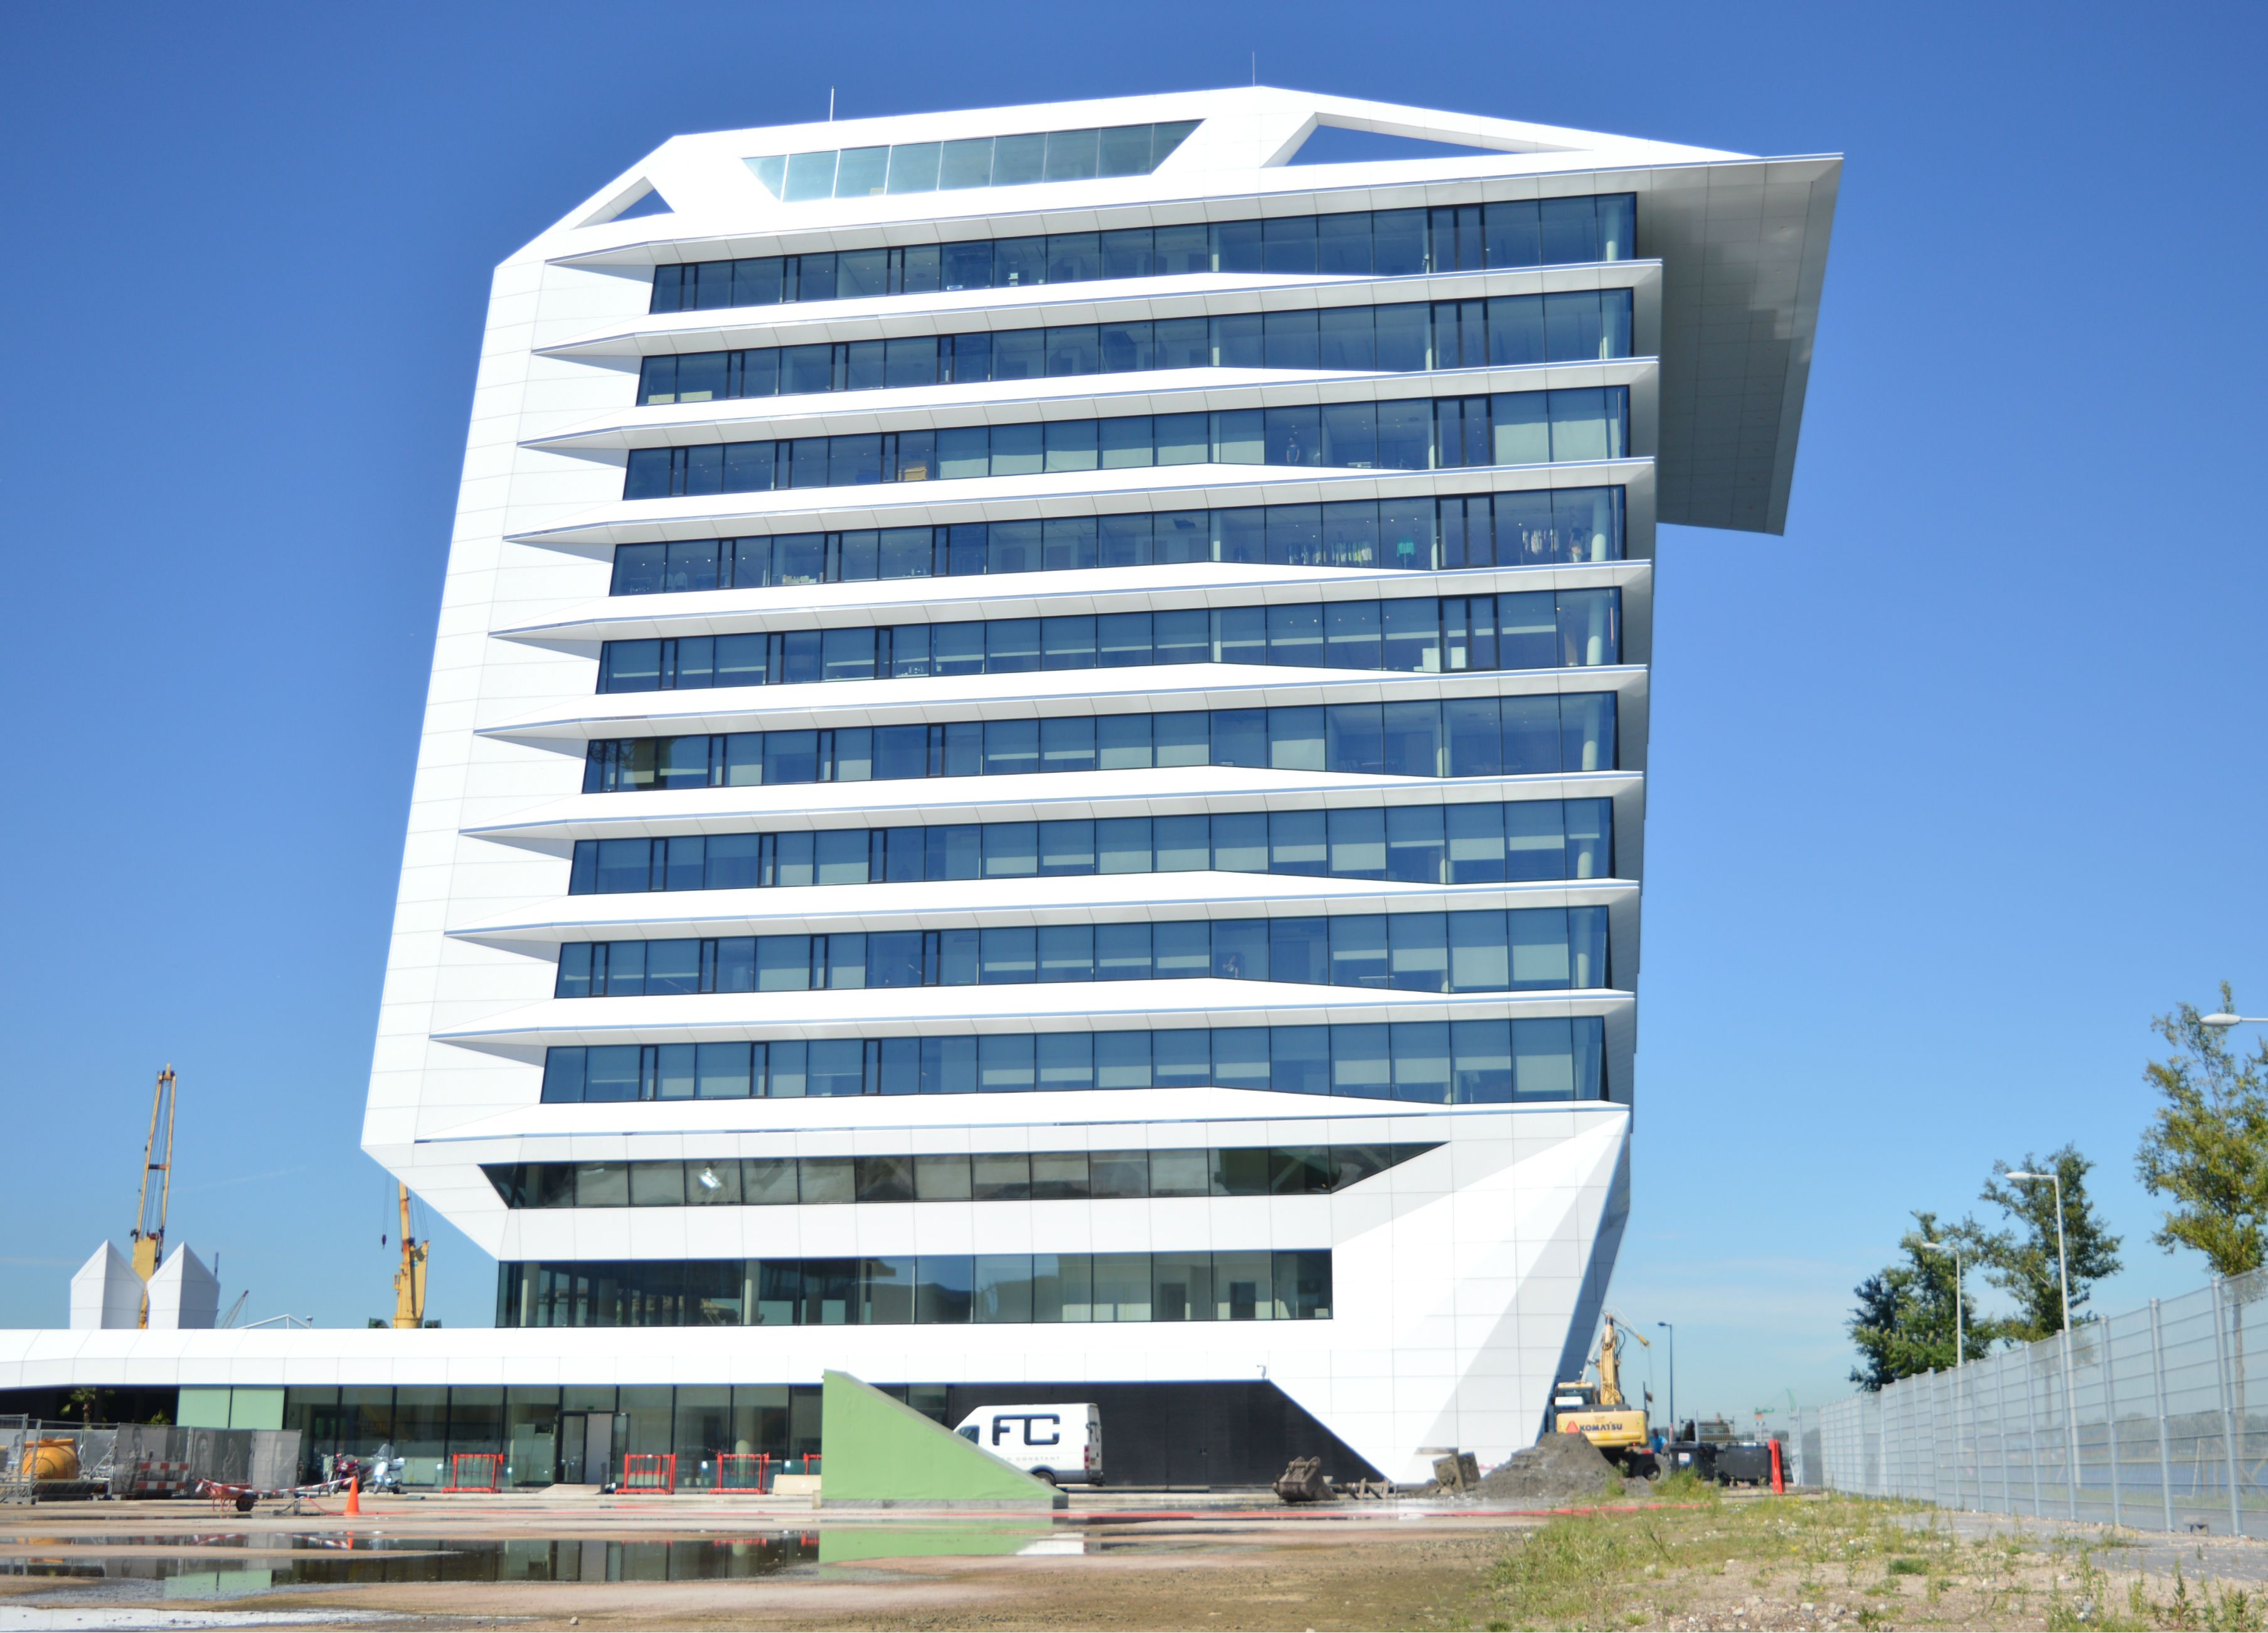 Nieuwbouw Porcellis gebouw Amsterdam